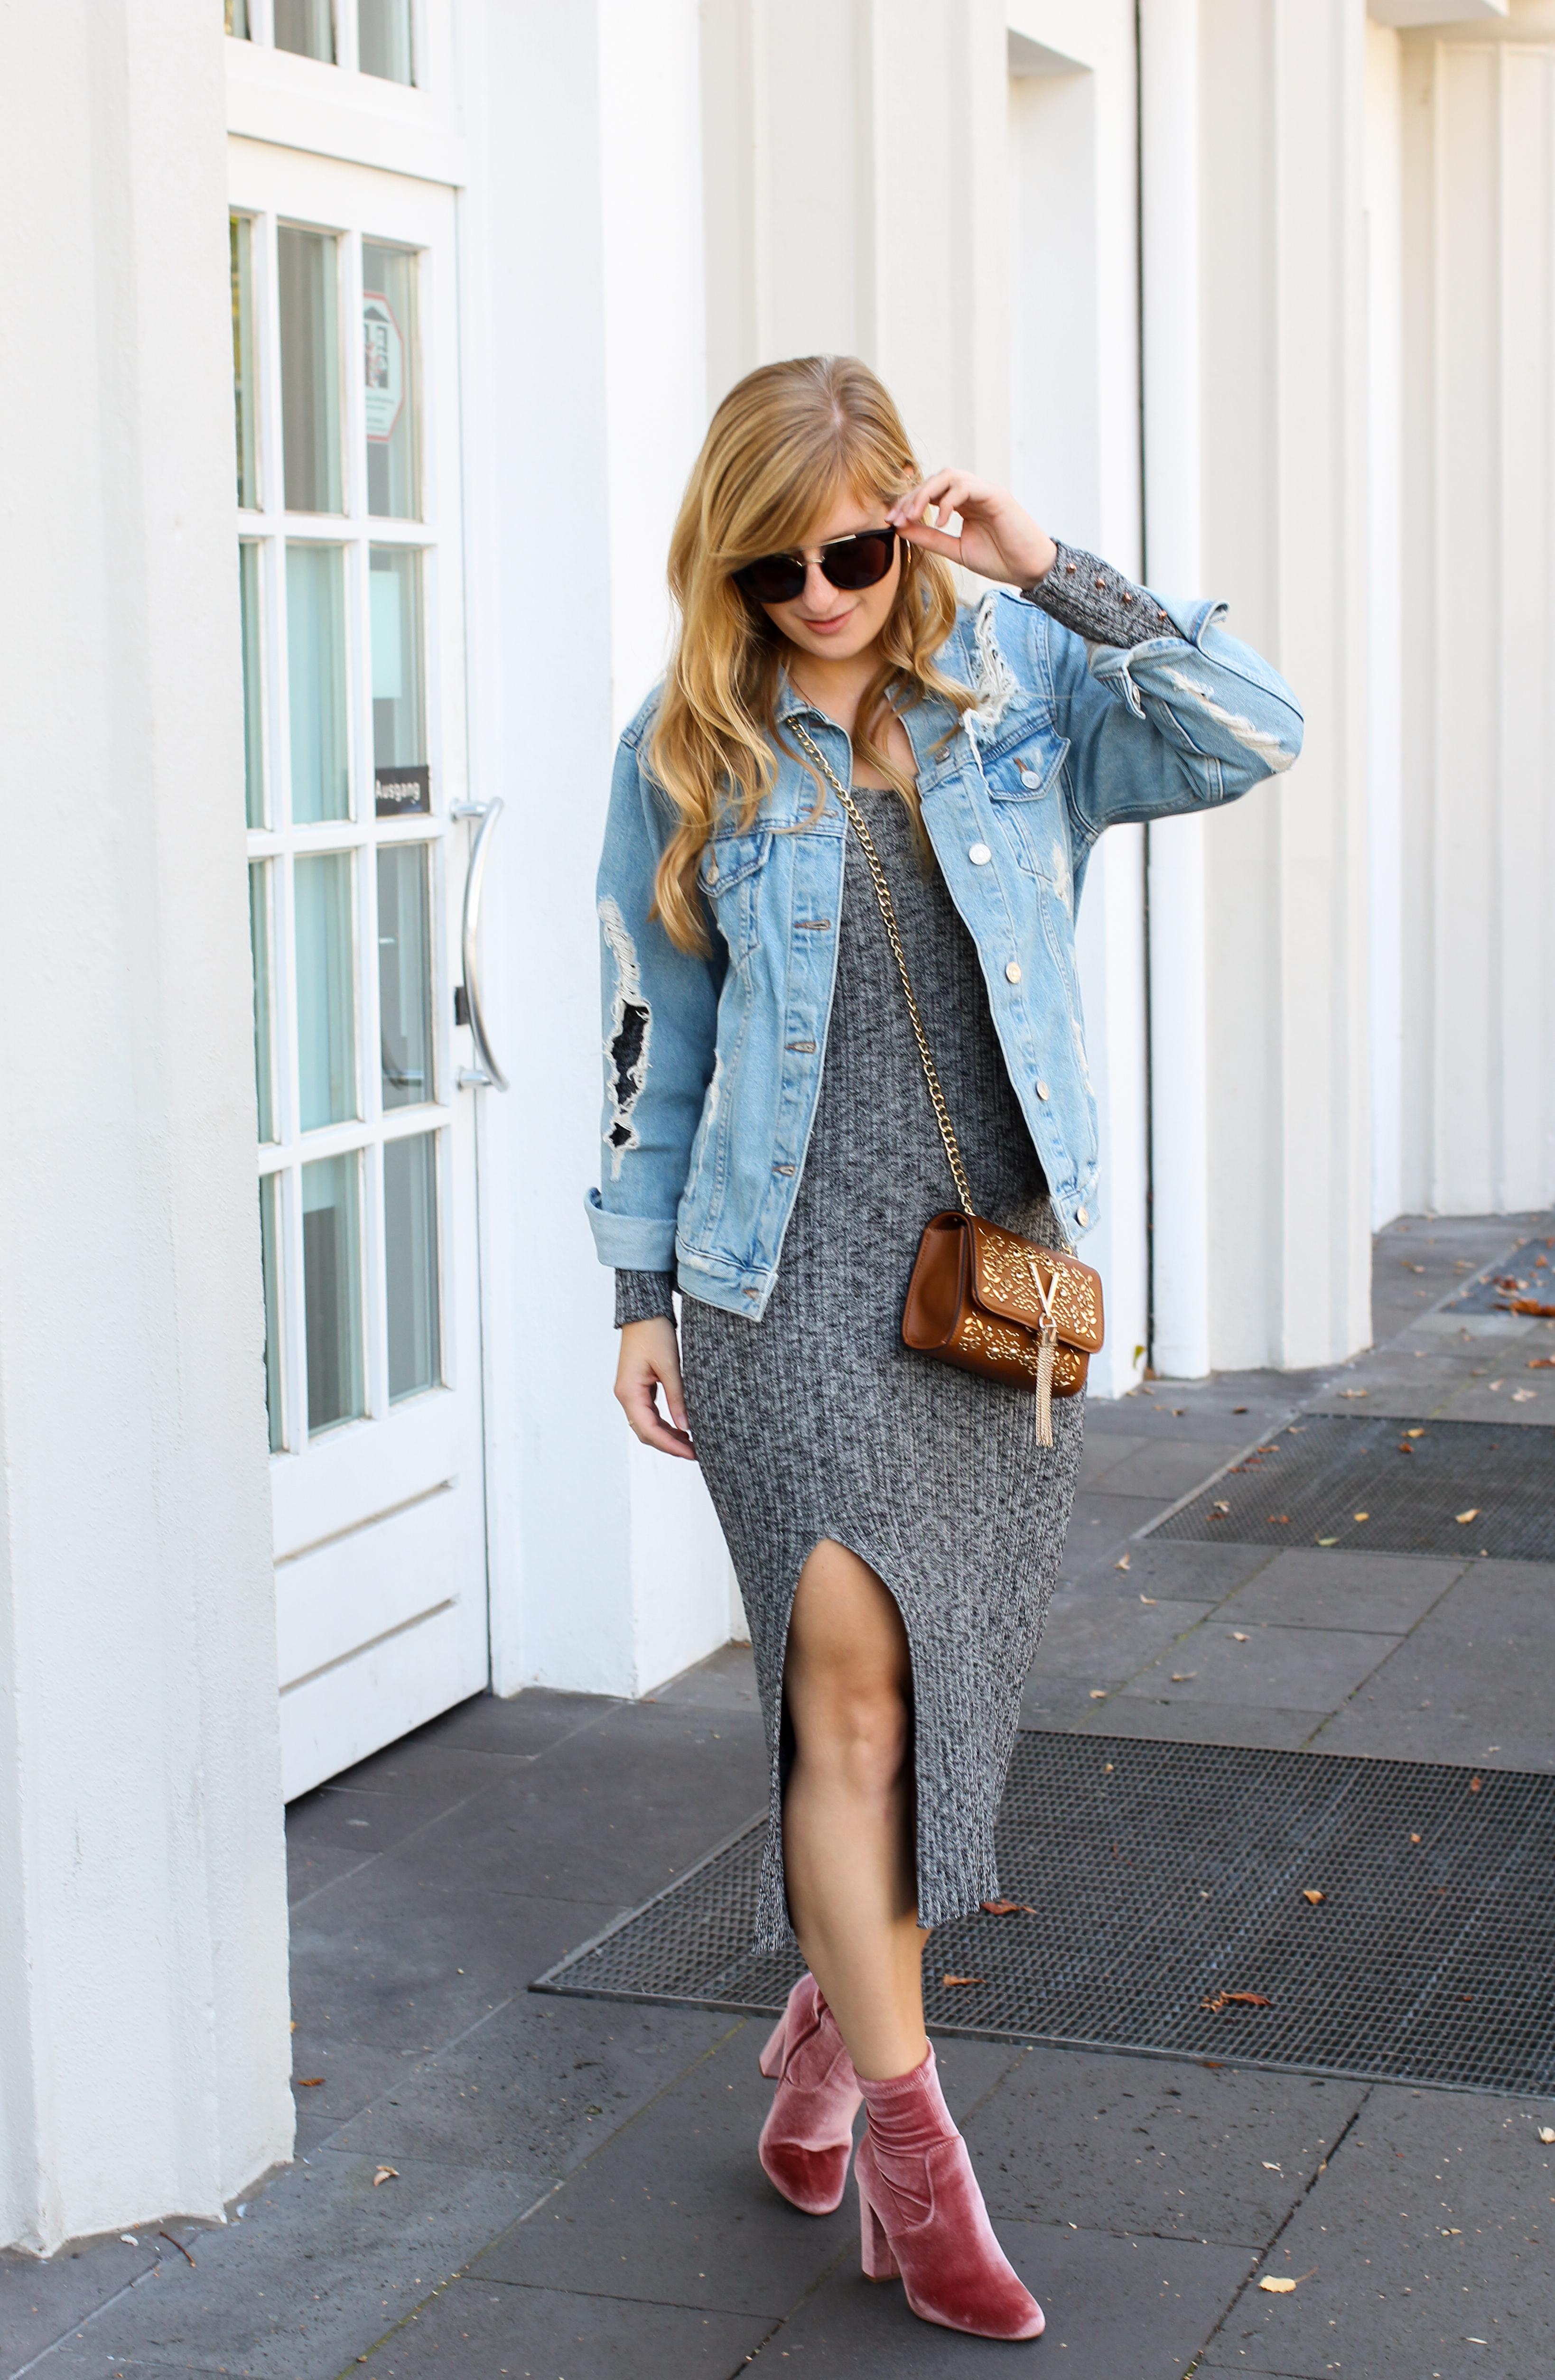 Herbstfavorit Wollkleid grau kombinieren Outfit rosa samt Heels Stiefeletten Jeansjacke Valentino Handbags Fashion Blog Bonn Herbstoutfit 4